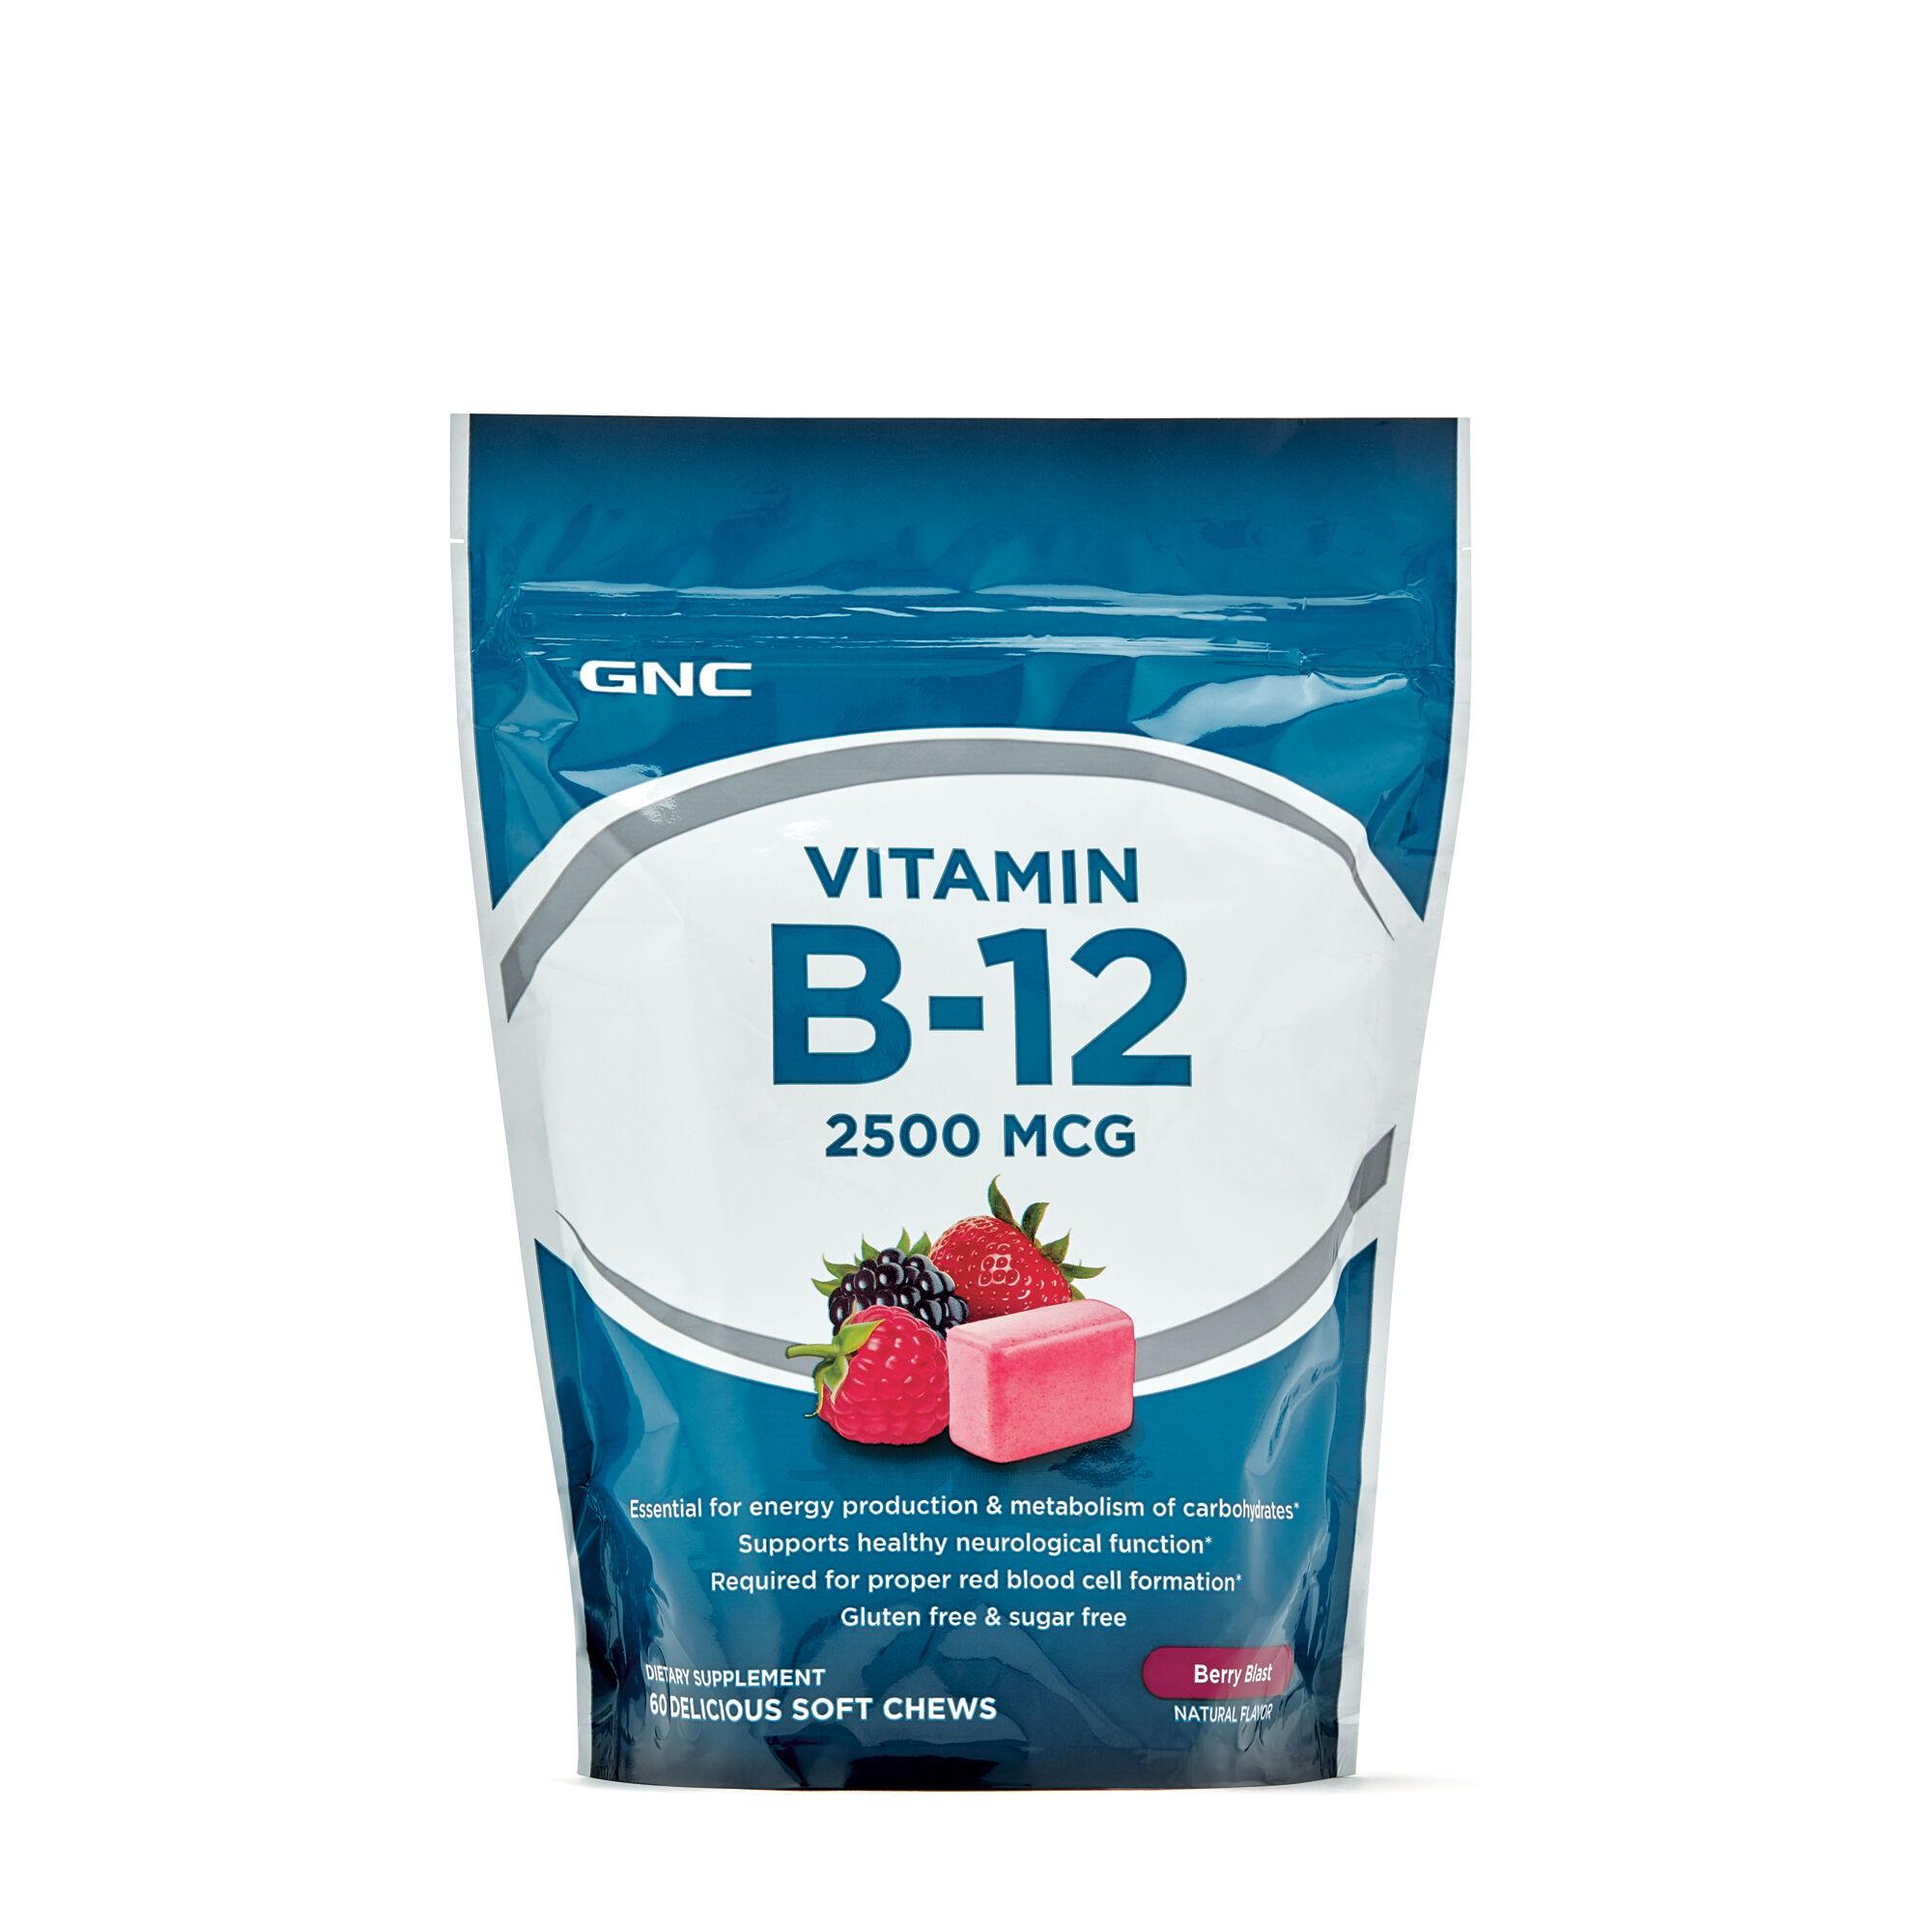 GNC Vitamin B-12 Soft Chews